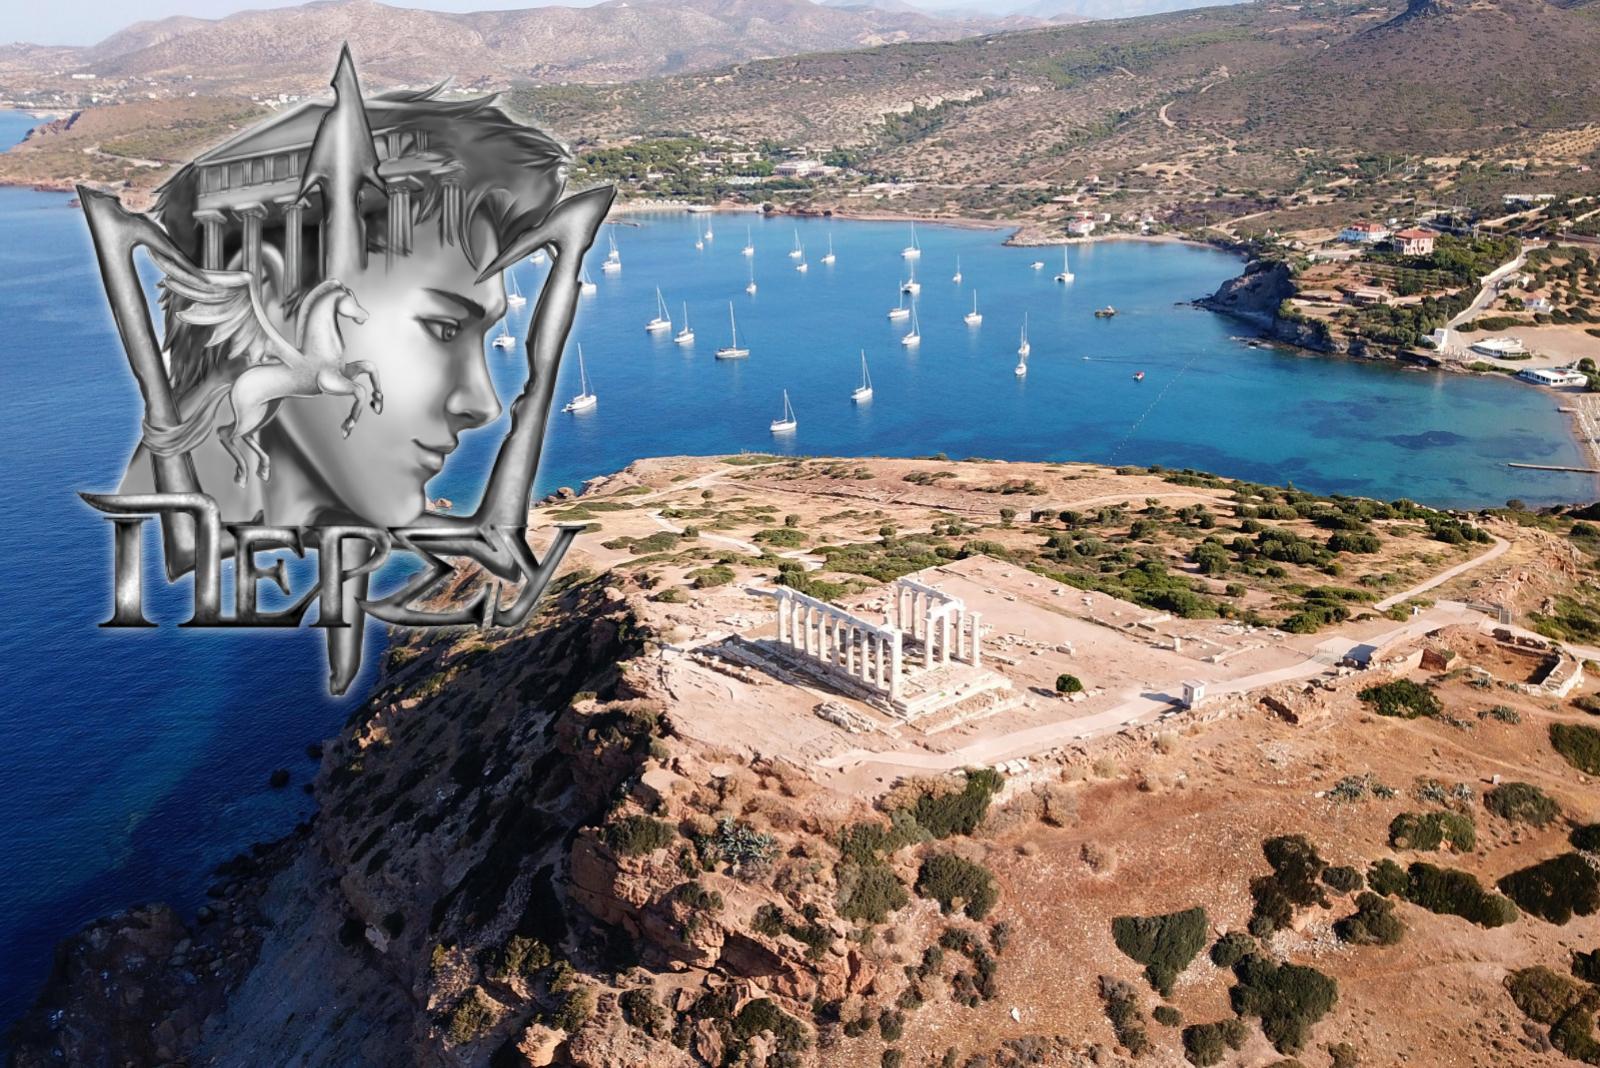 Percy Jackson temple of Poseidon Sounio Greece mythology tour KidsLoveGreece.com